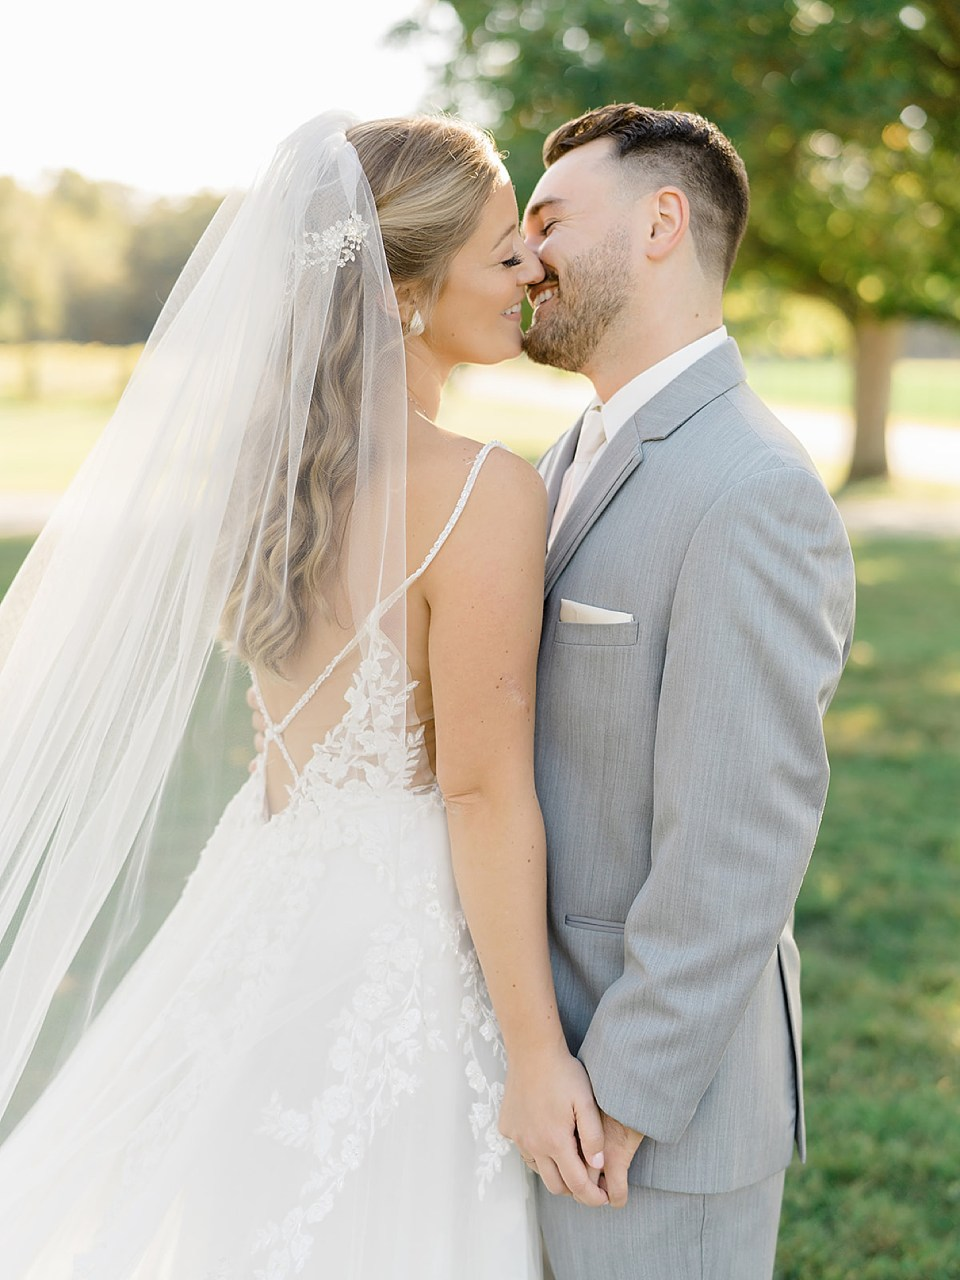 Valenzano Winery Vitners Pavillion Wedding Photography by Magdalena Studios 0028